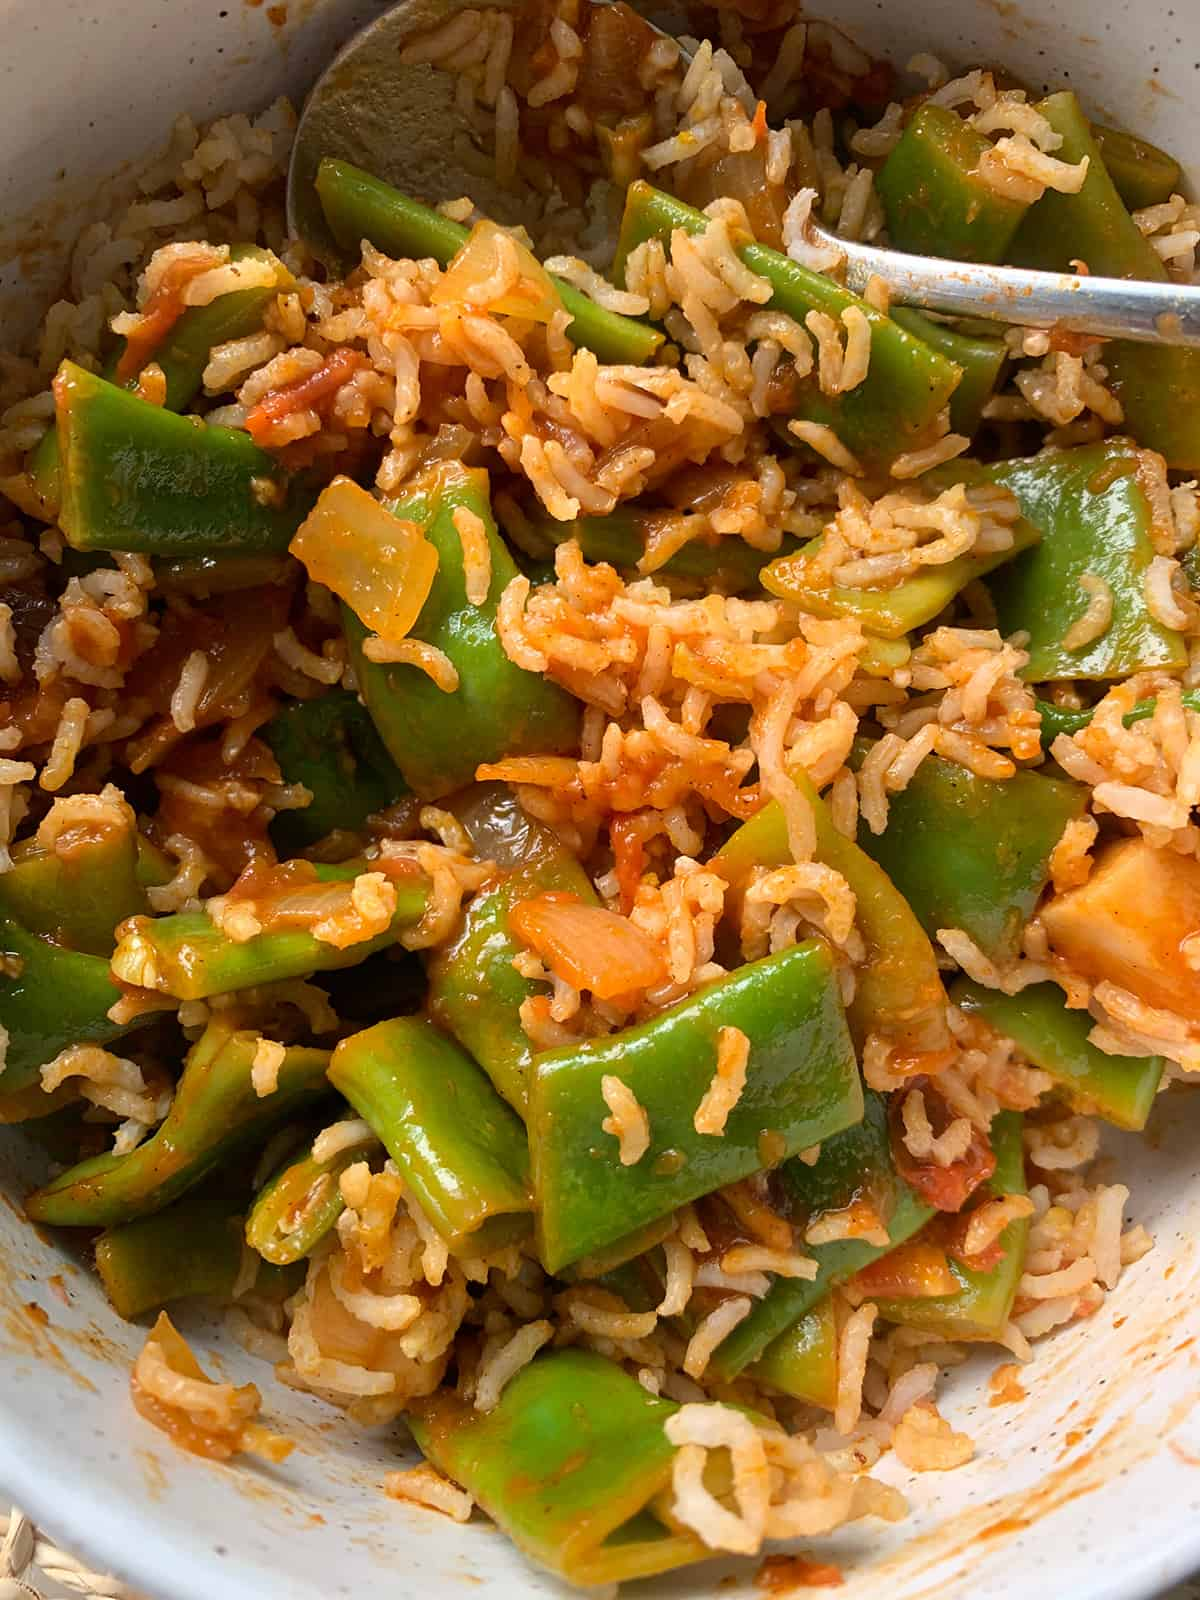 Green Beans - Loubieh bi Zeit mixed with brown basmati rice